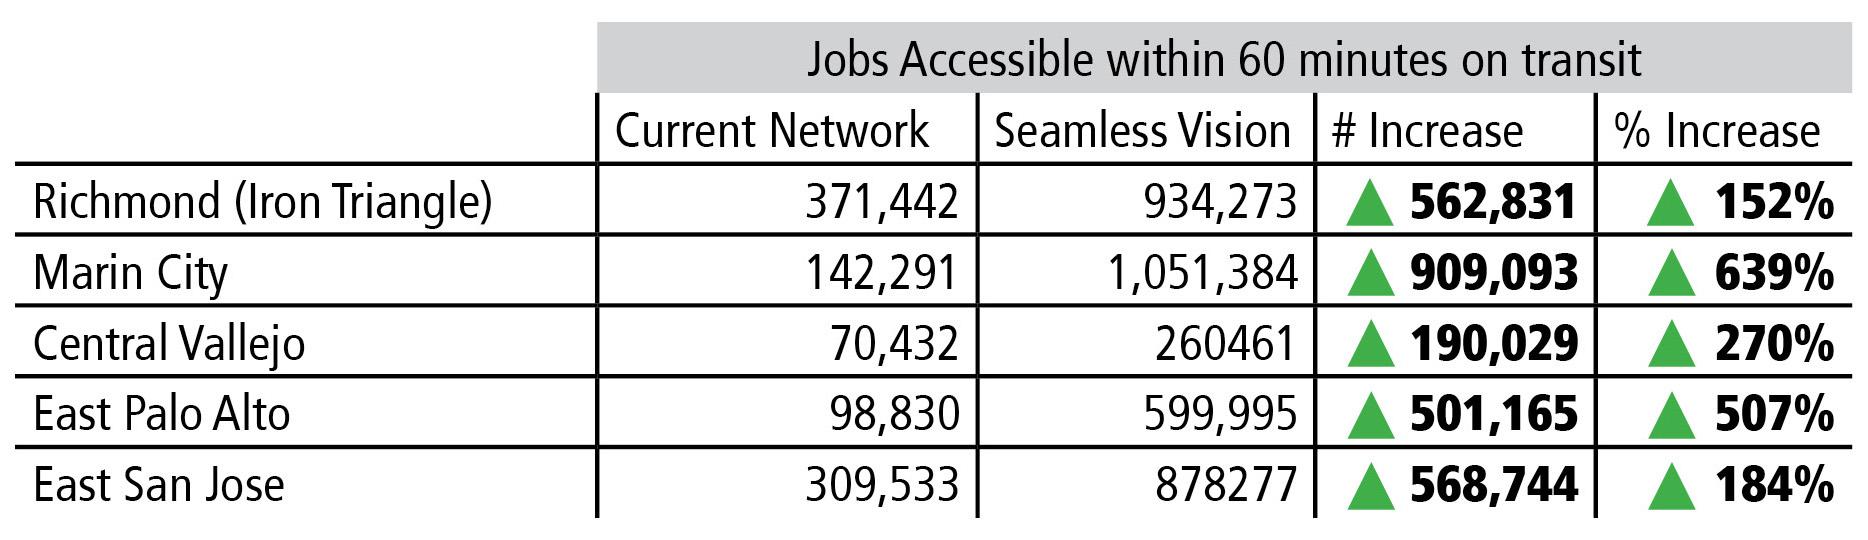 jobs-calcs.jpg